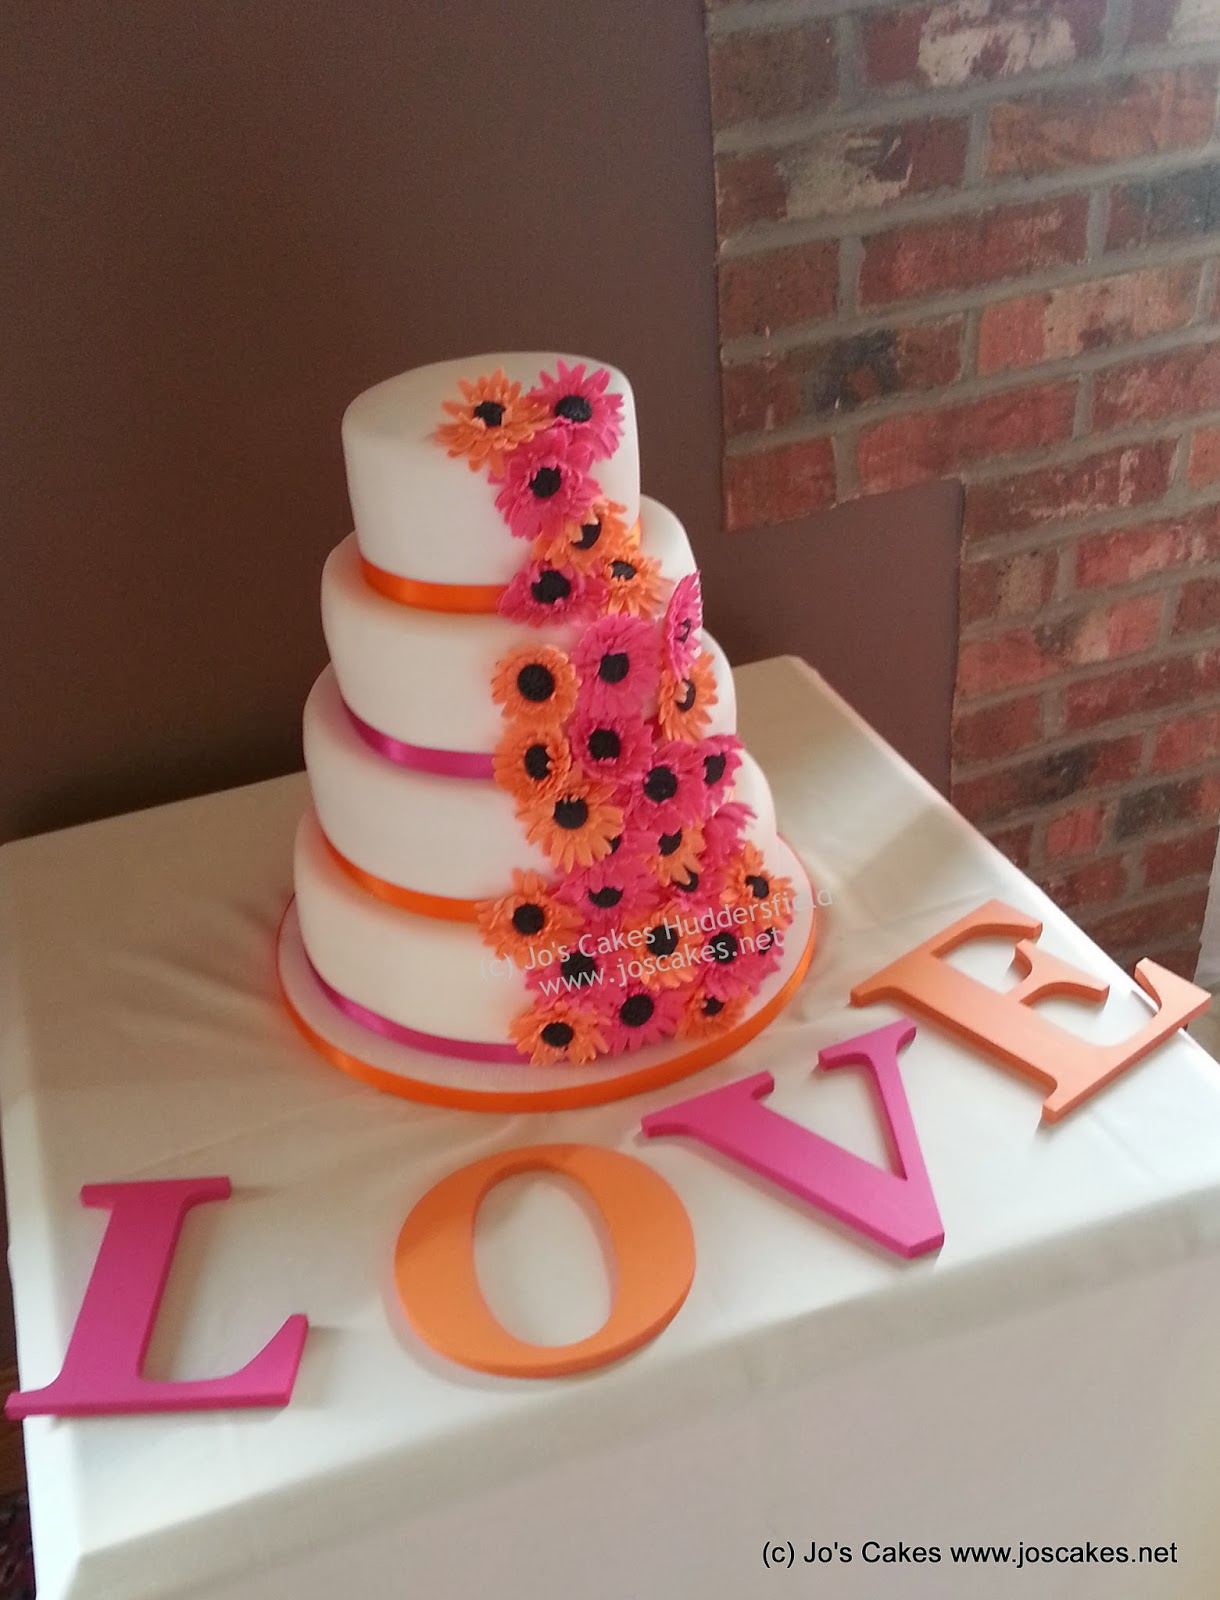 Jo s Cakes Hot Pink and Orange Gerberas Wedding Cake